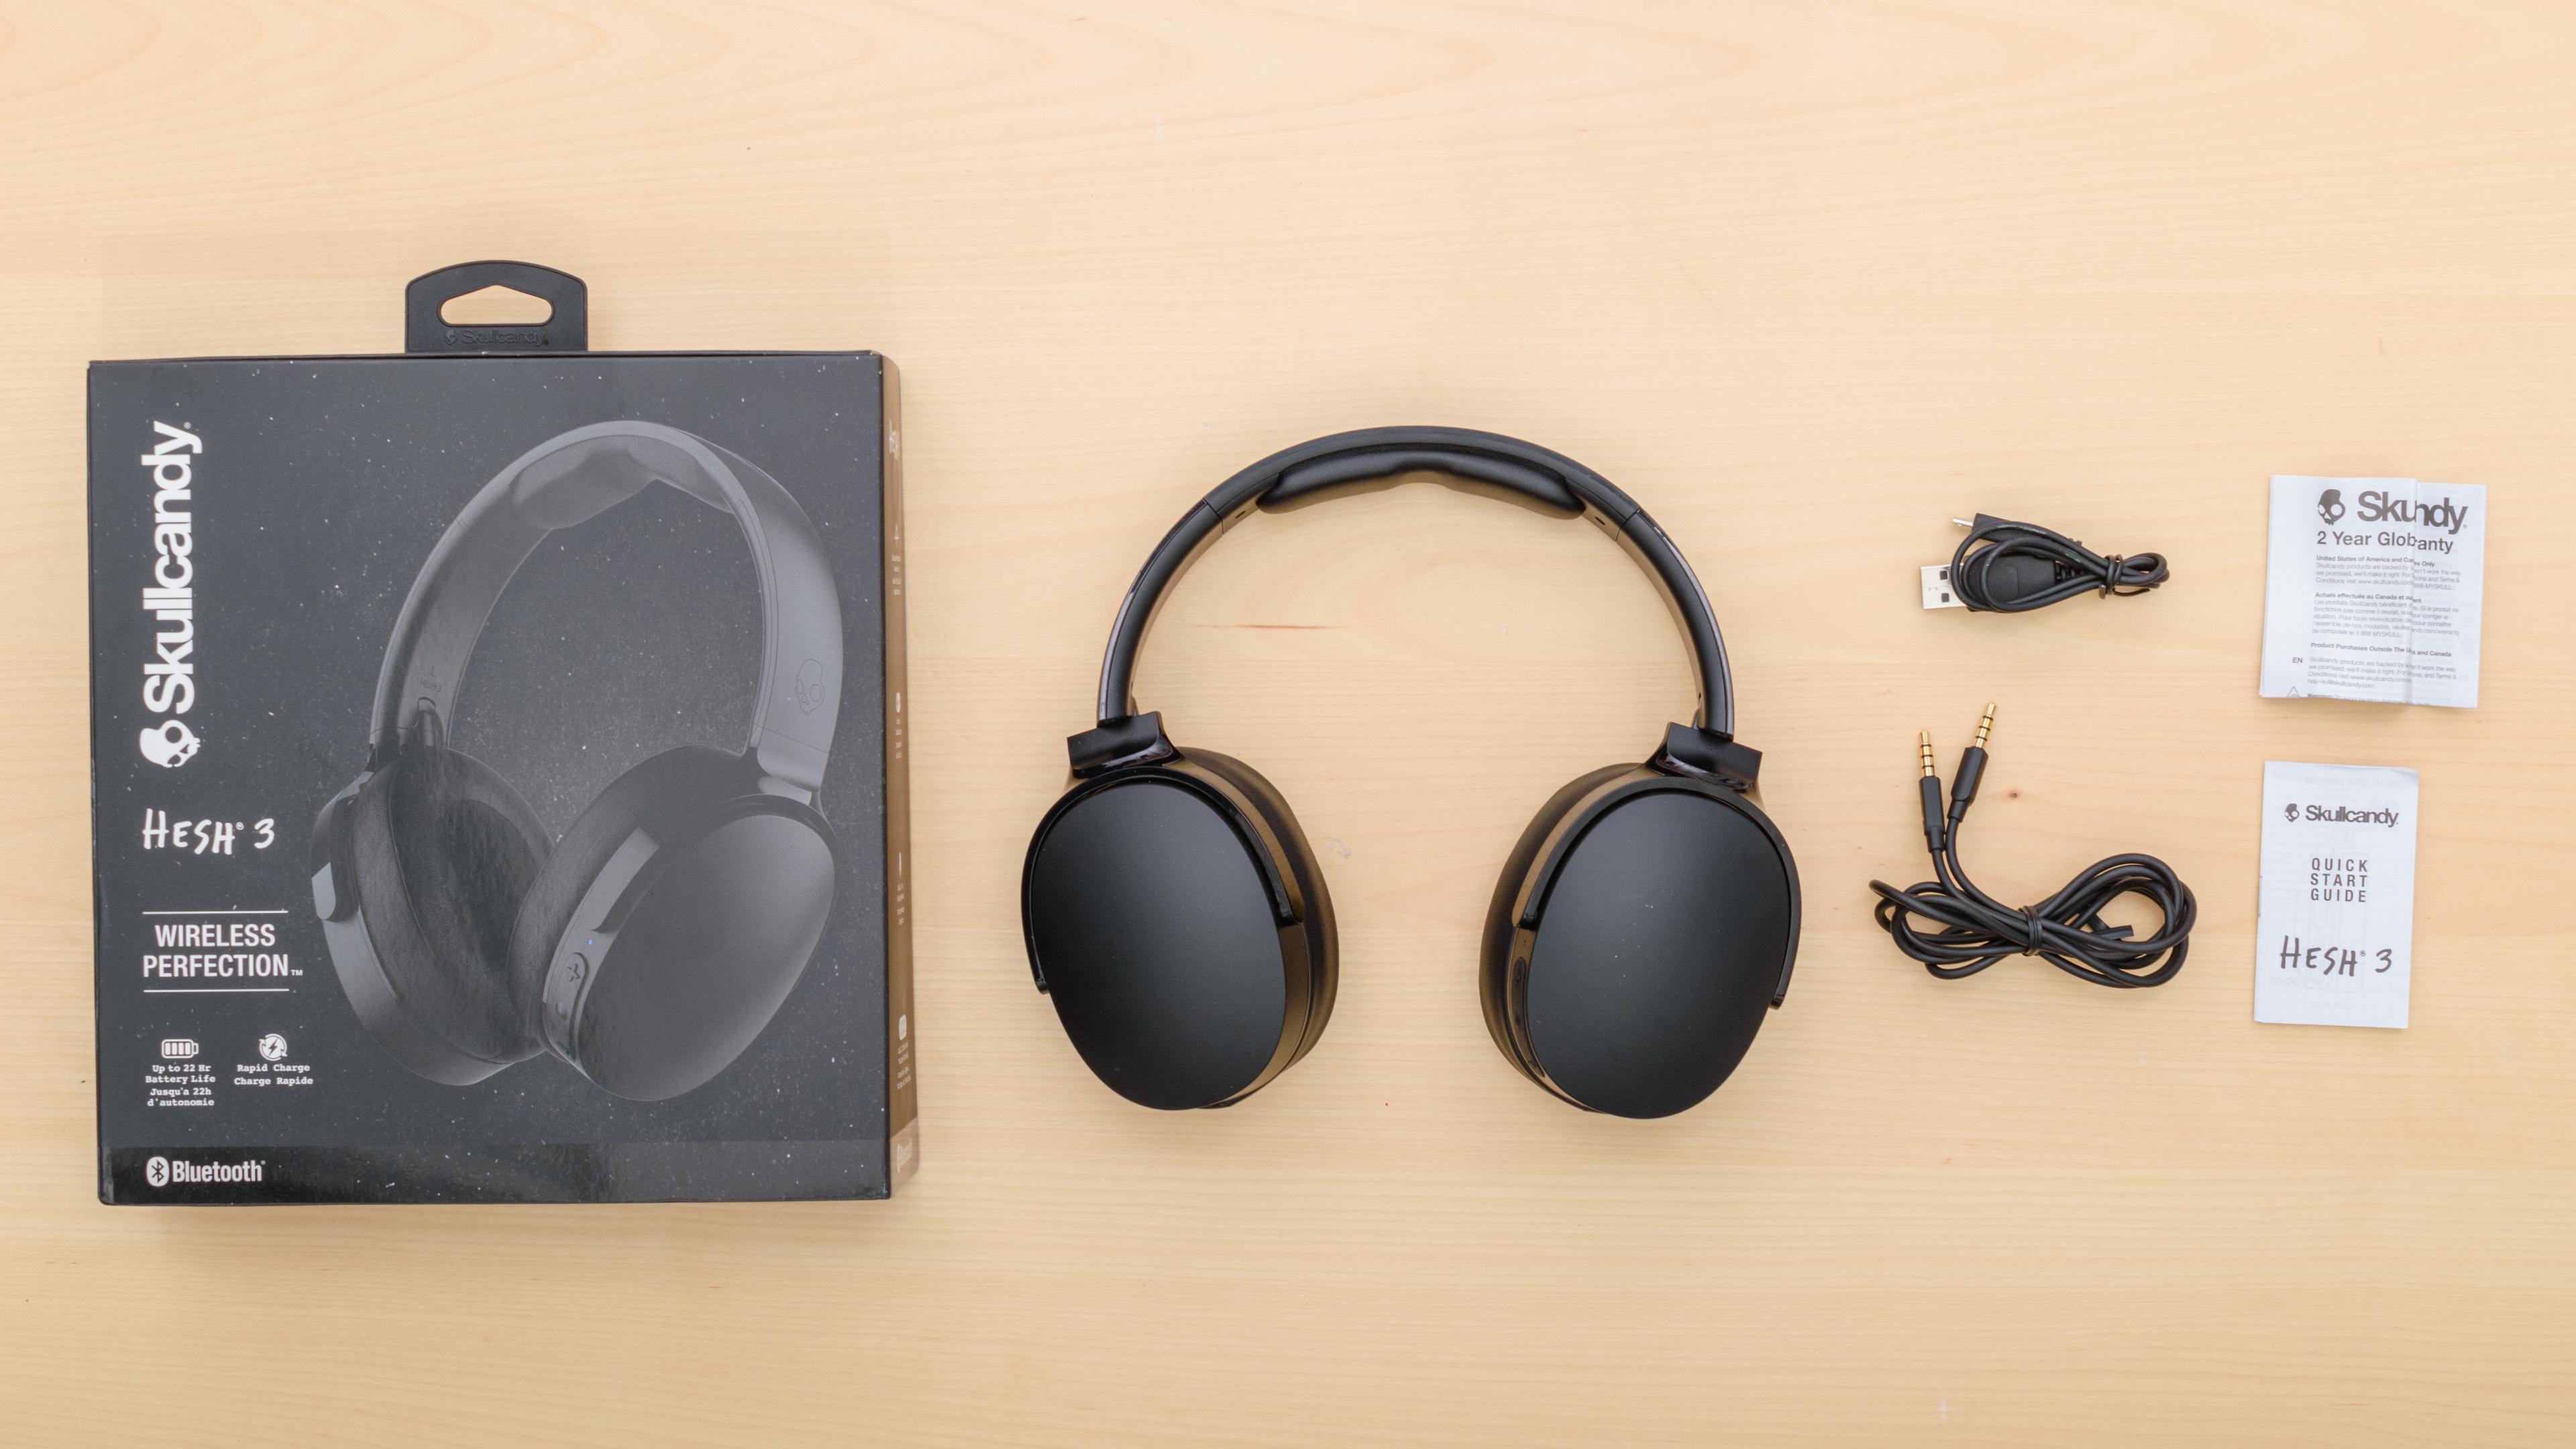 skullcandy bluetooth earbuds user manual